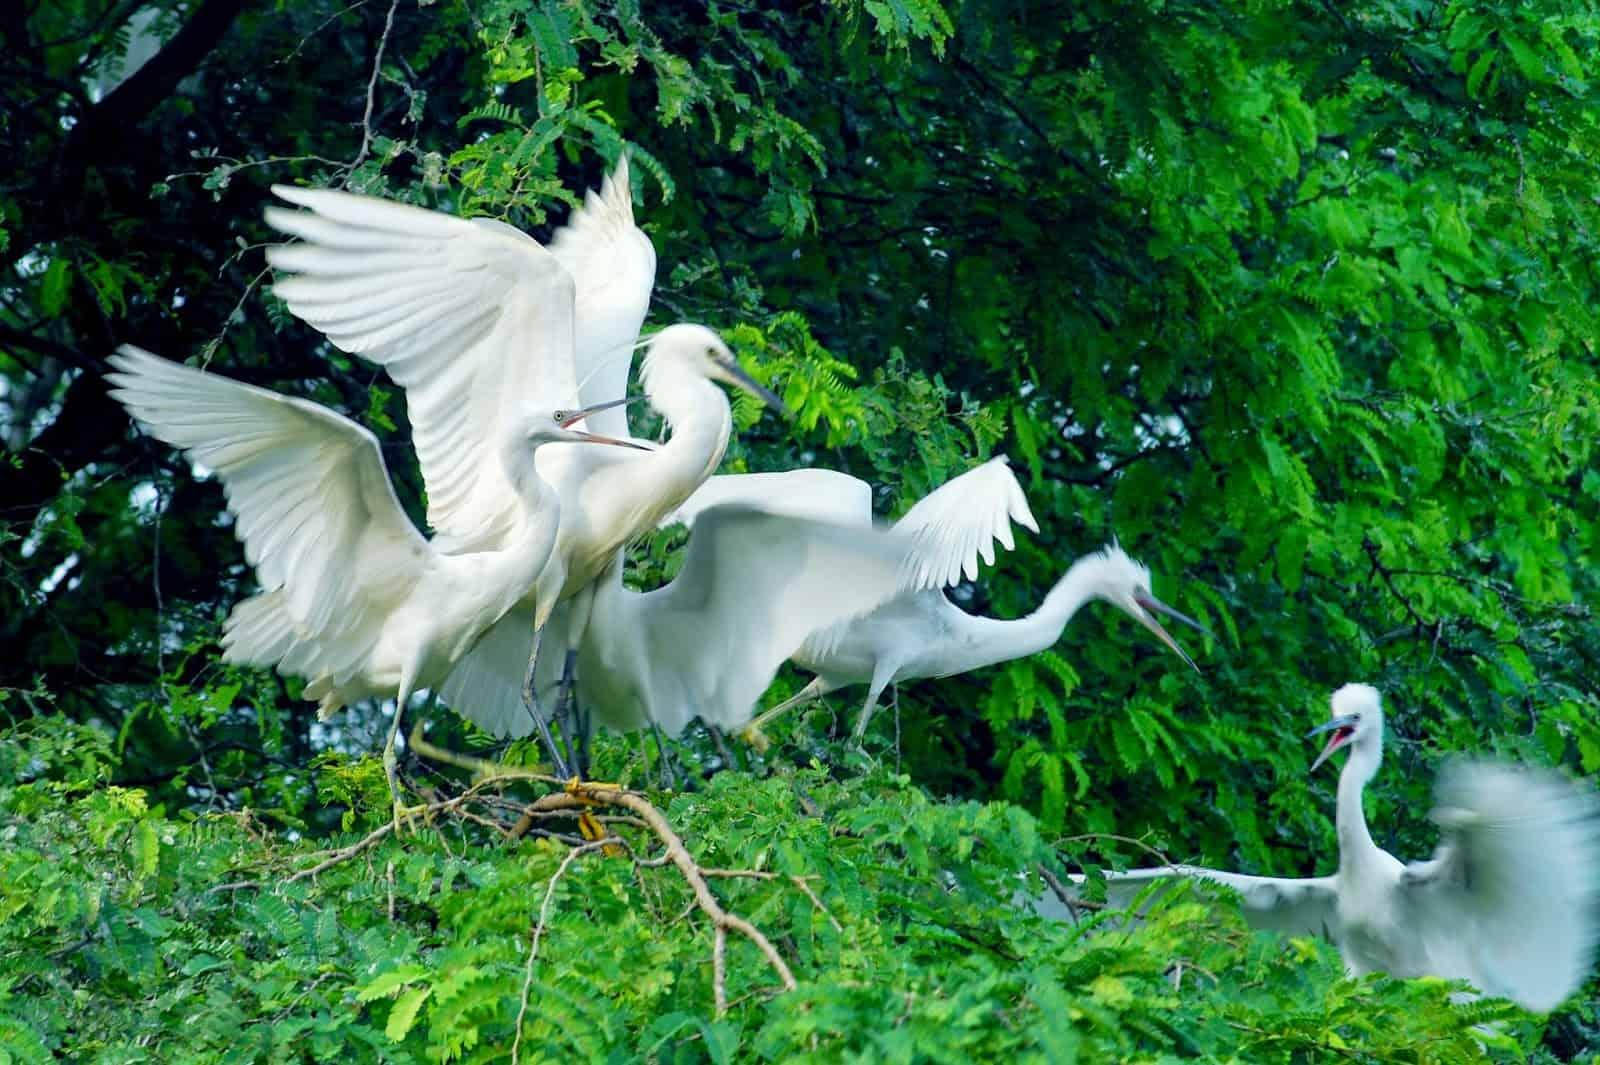 bang-lang-stork-garden